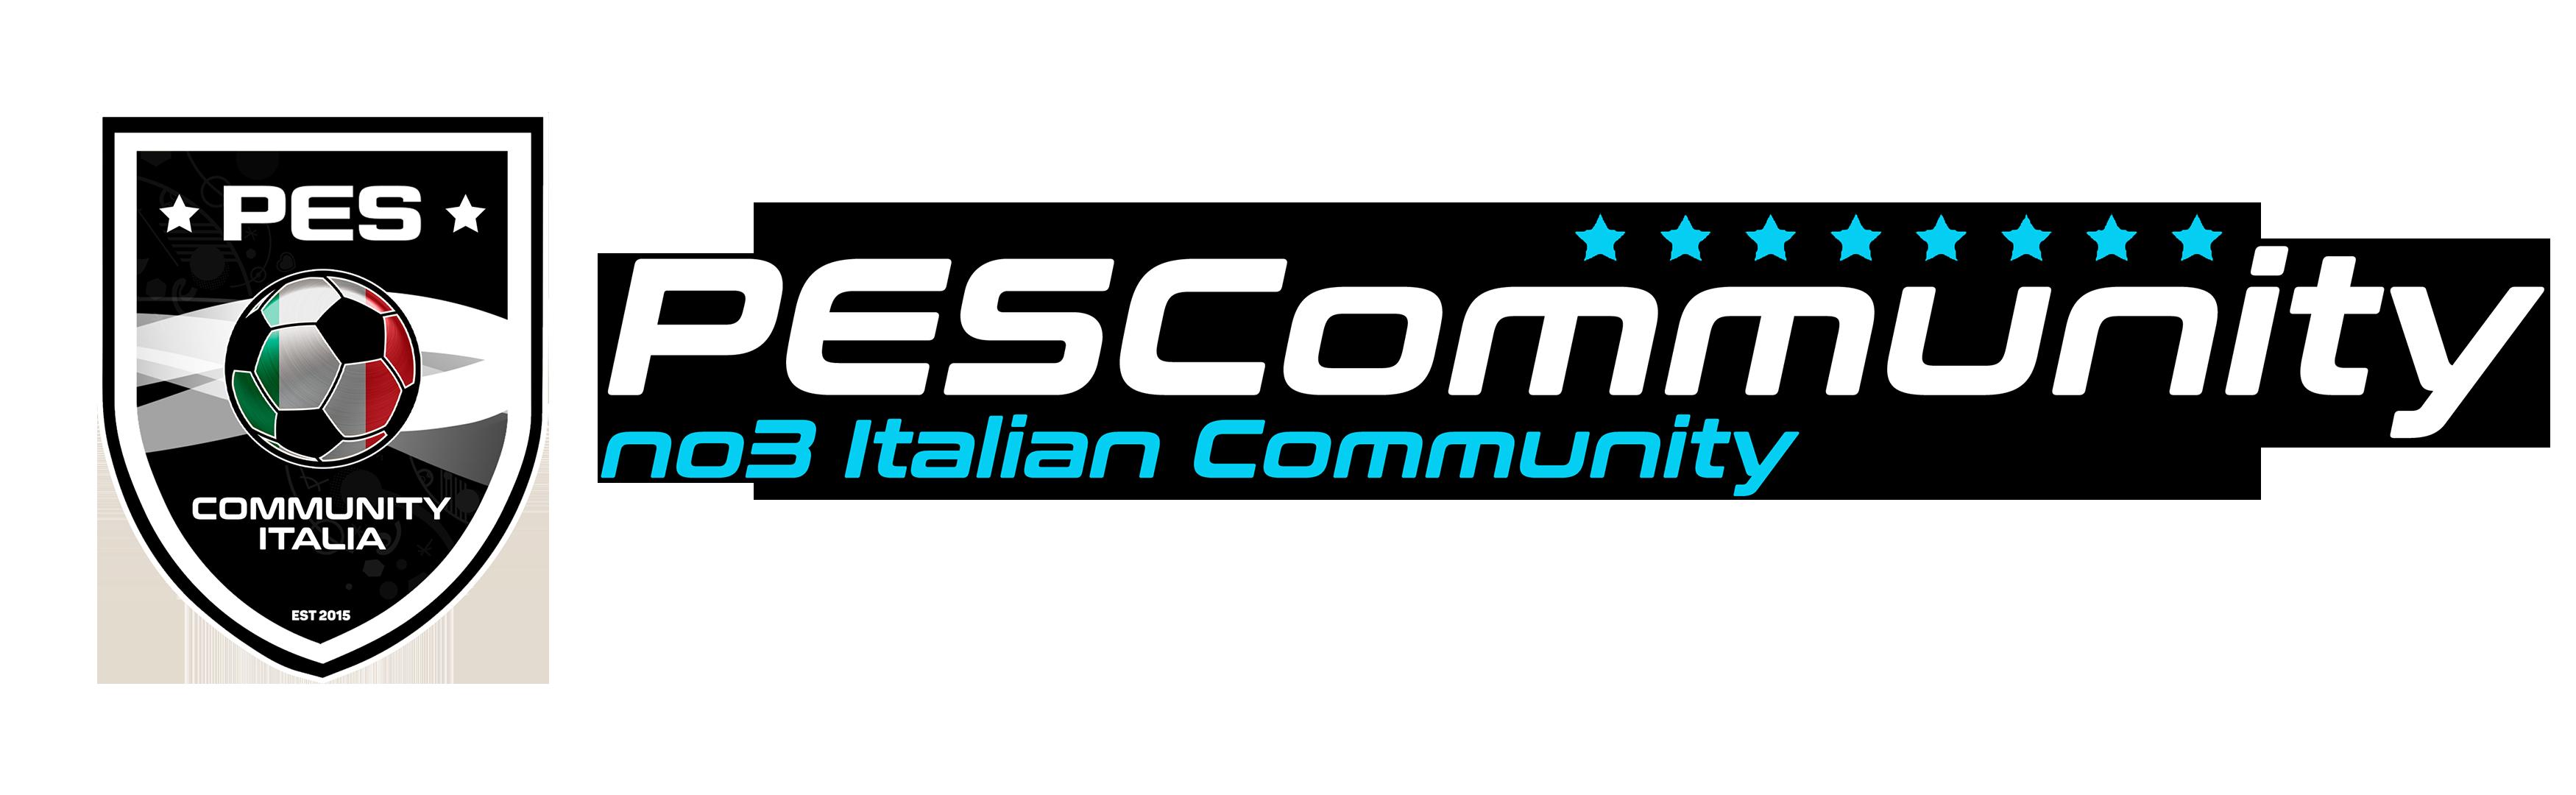 PESCommunity Italia